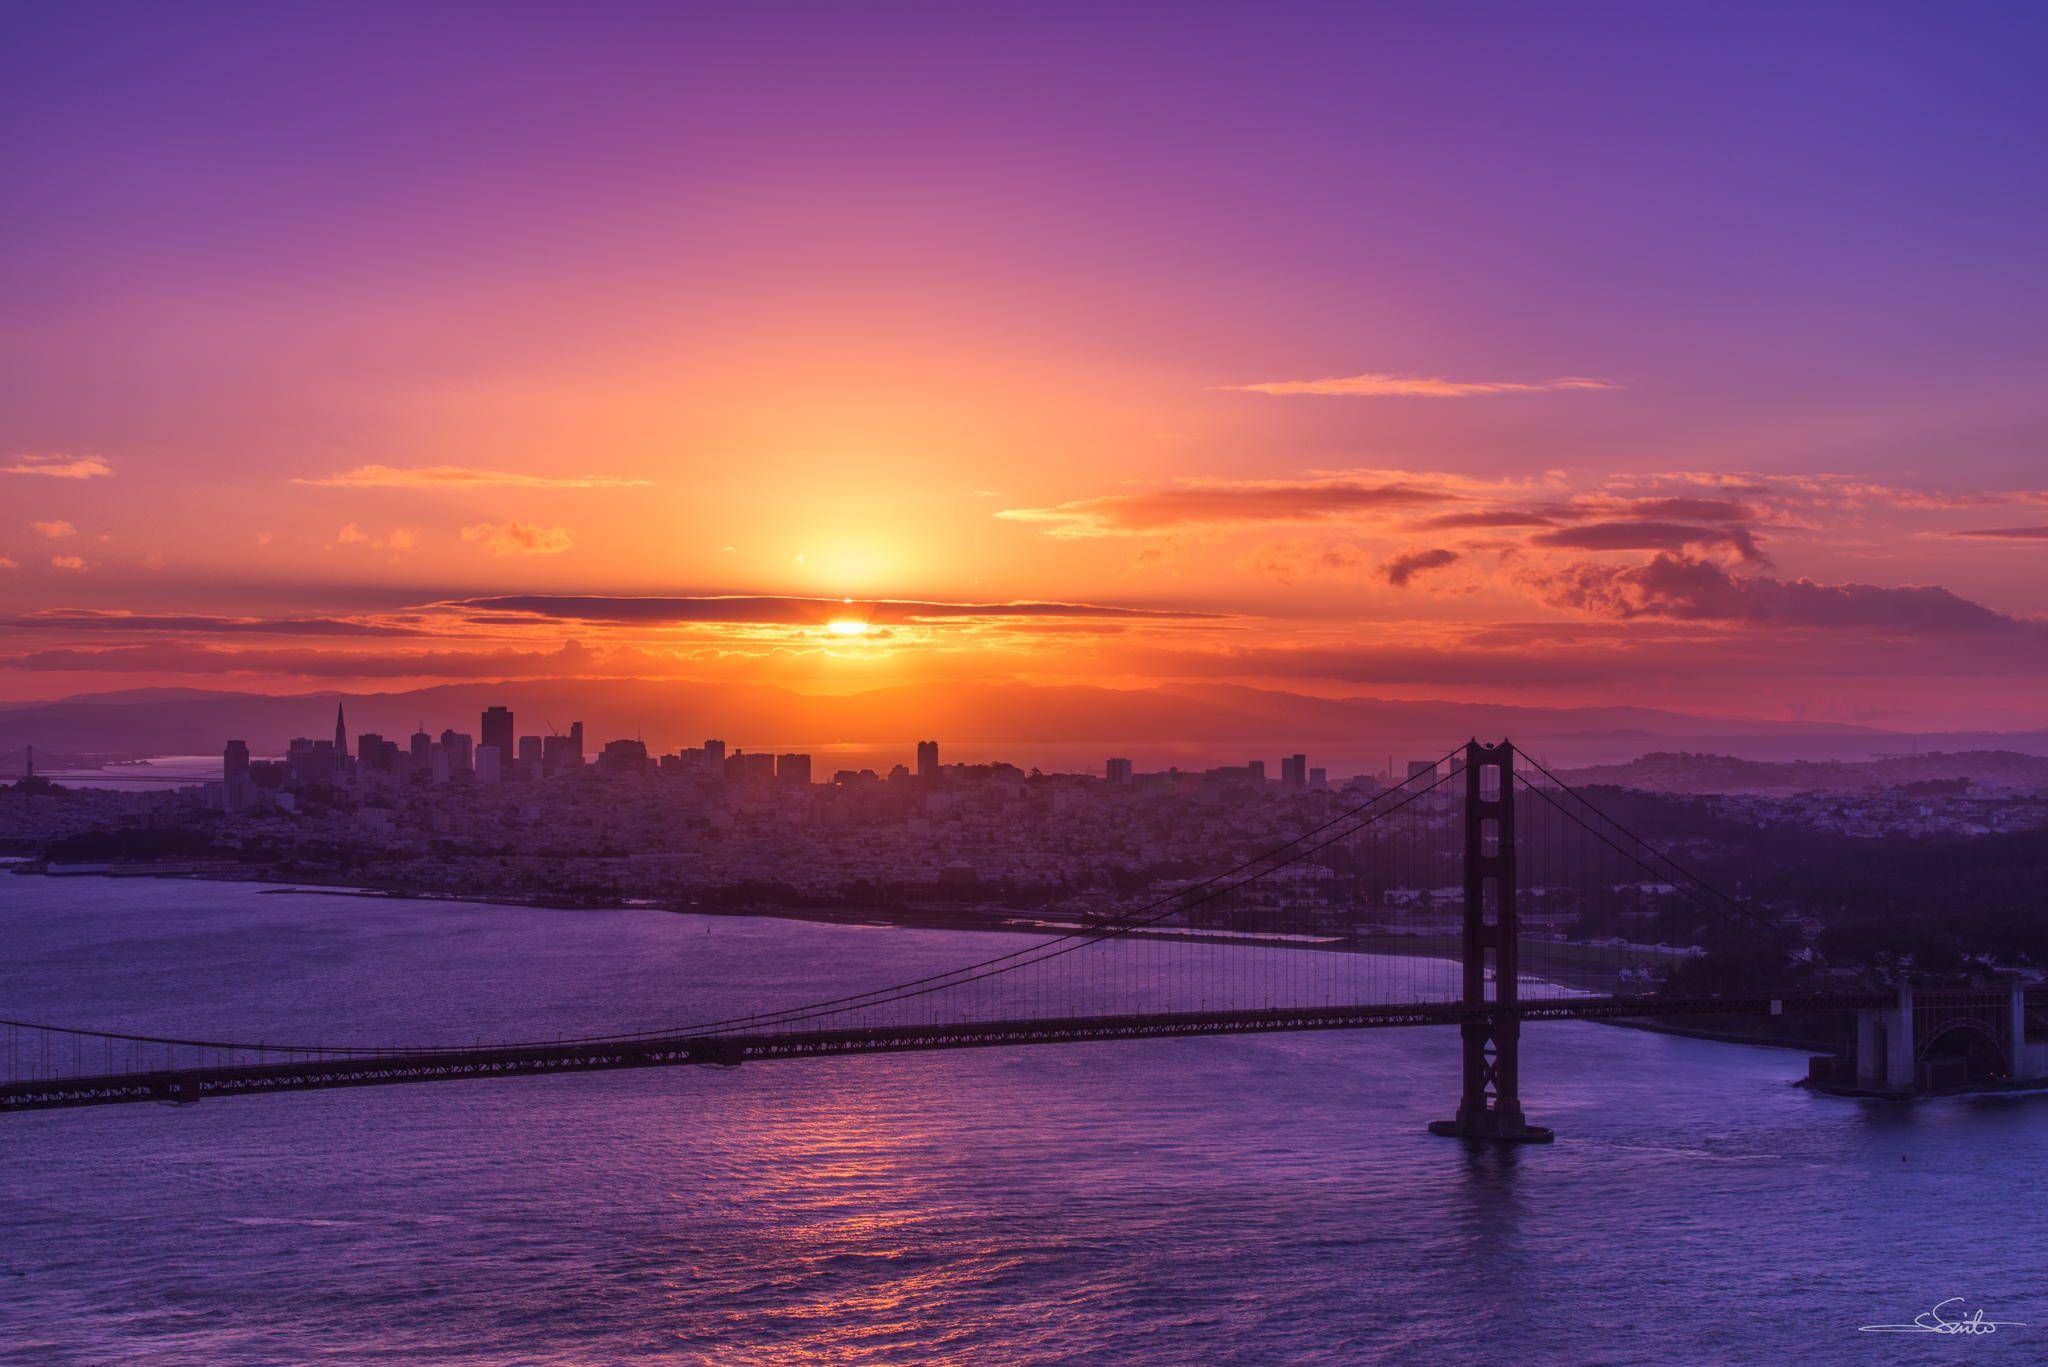 Sunrise by Shumon Saito on 500px